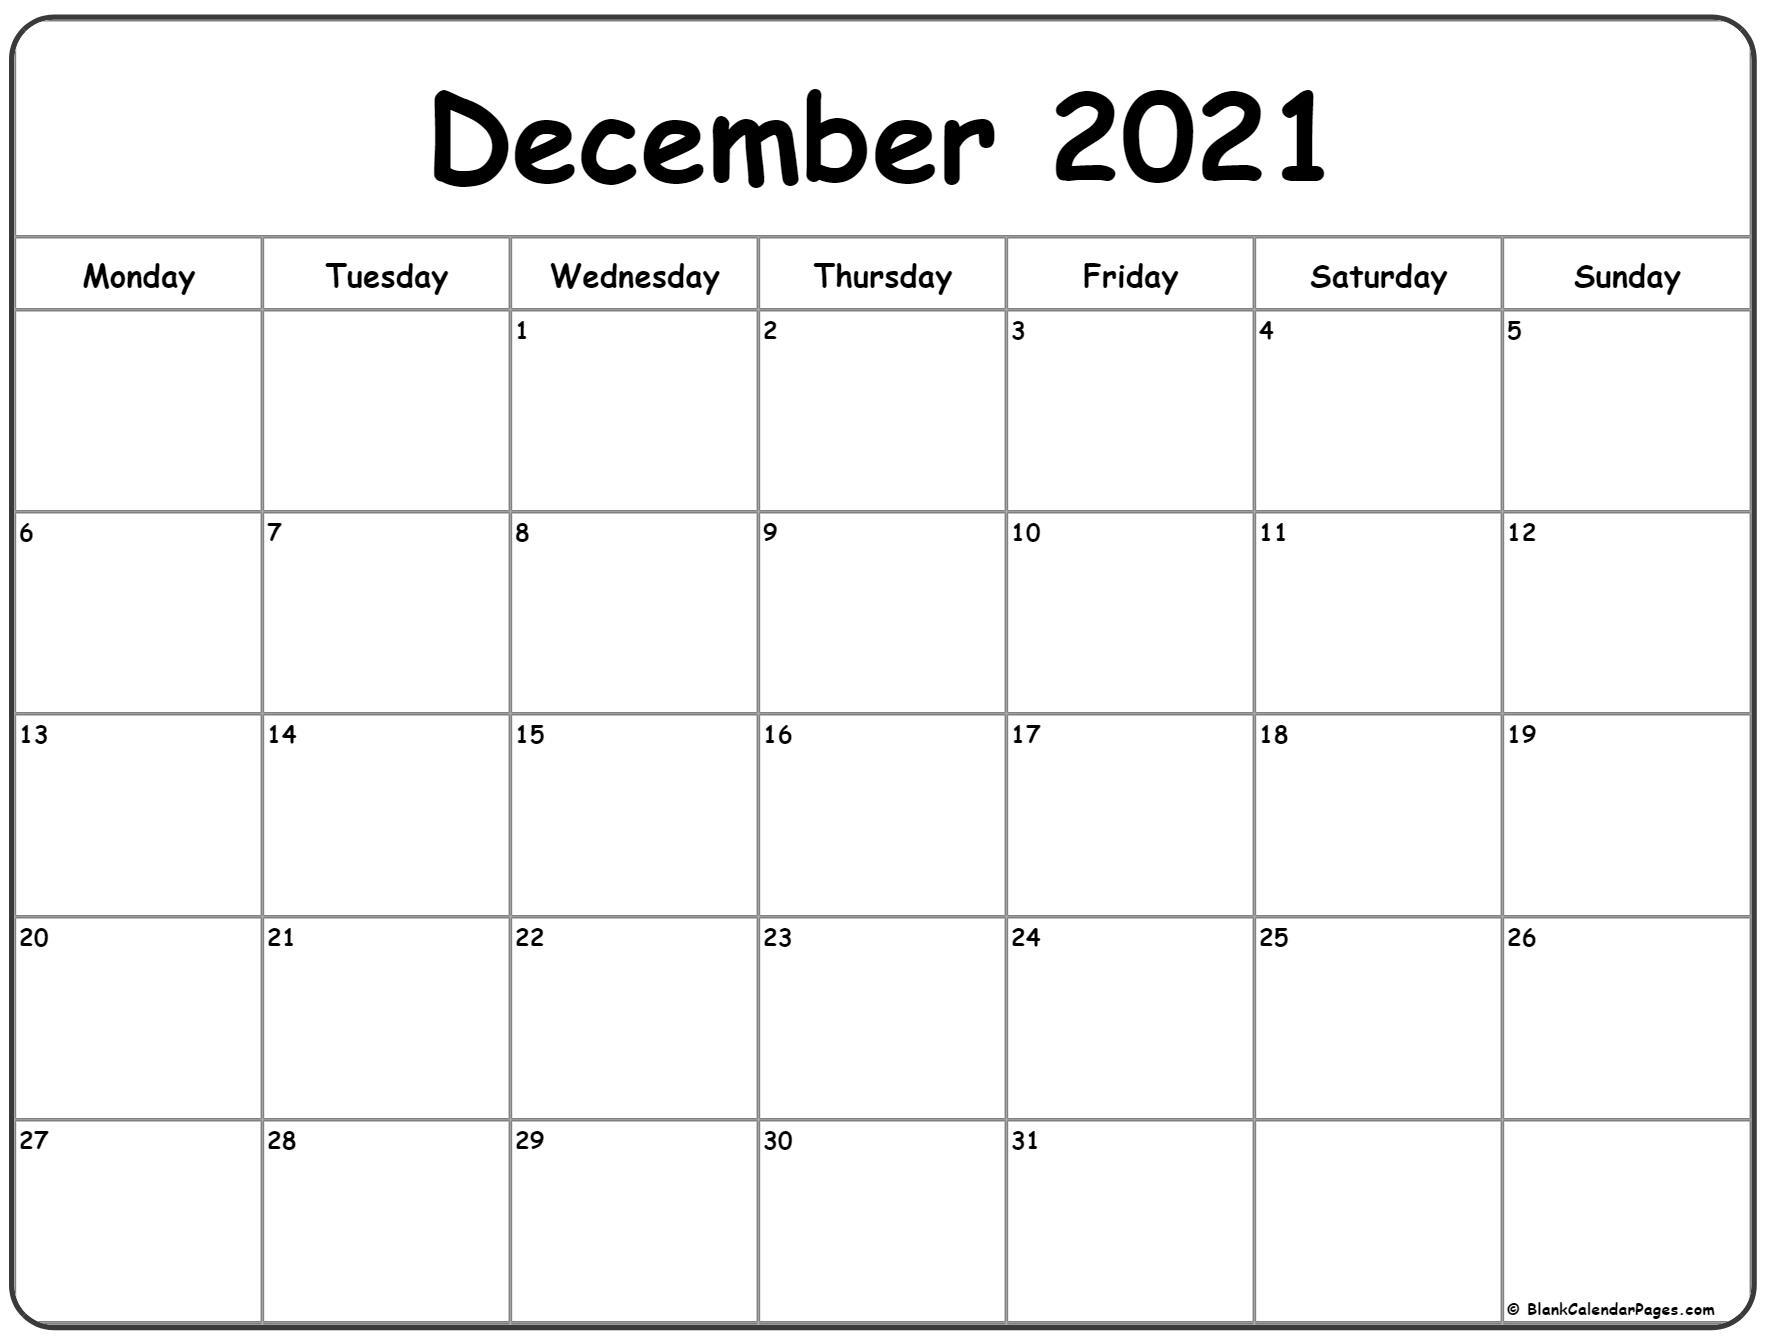 December 2021 Monday Calendar | Monday To Sunday